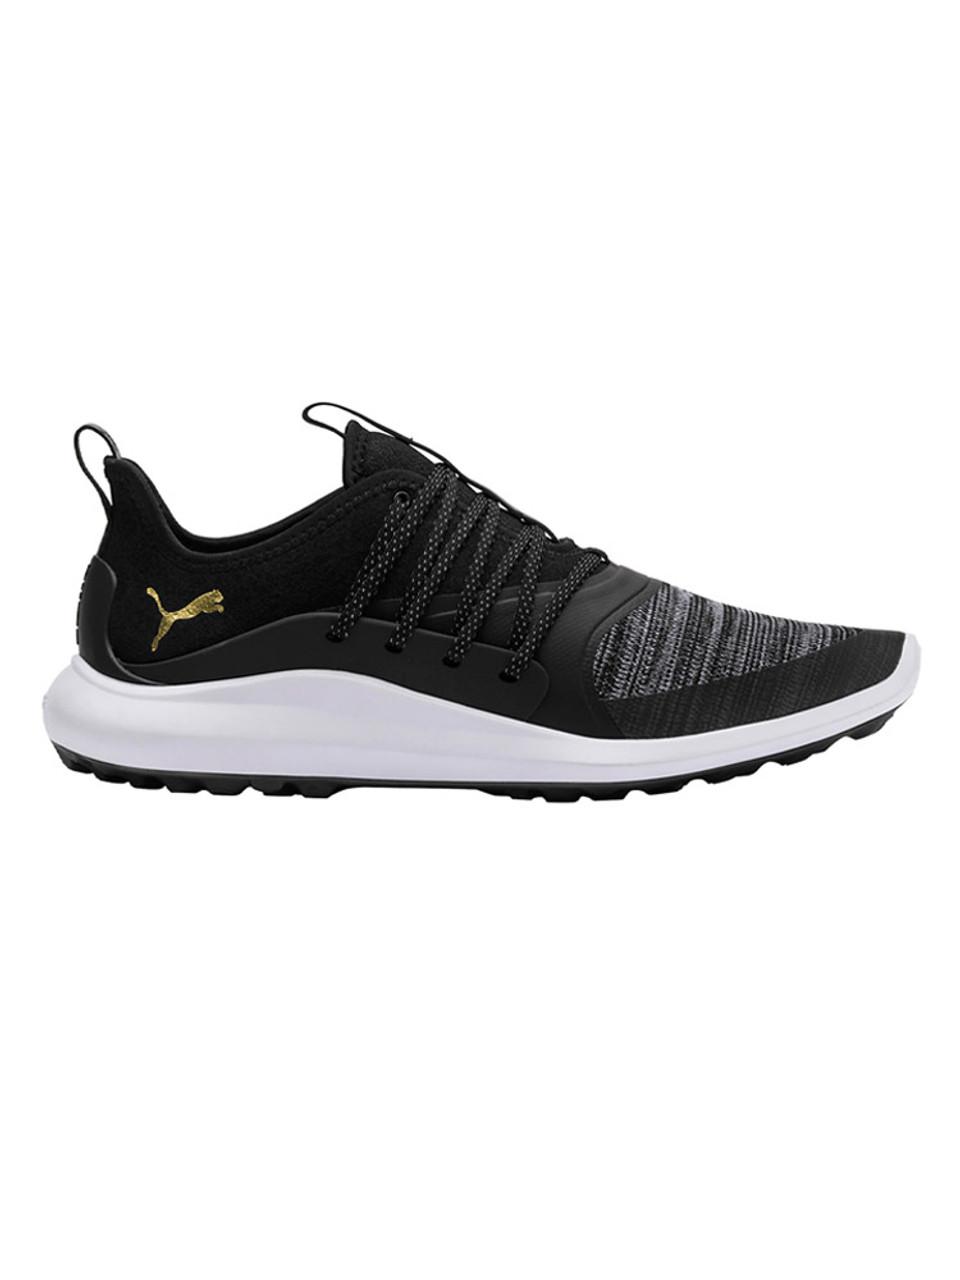 31b0f9ba0d0e Puma Ignite NXT Solelace Golf Shoes - Black Team Gold - Mens For ...